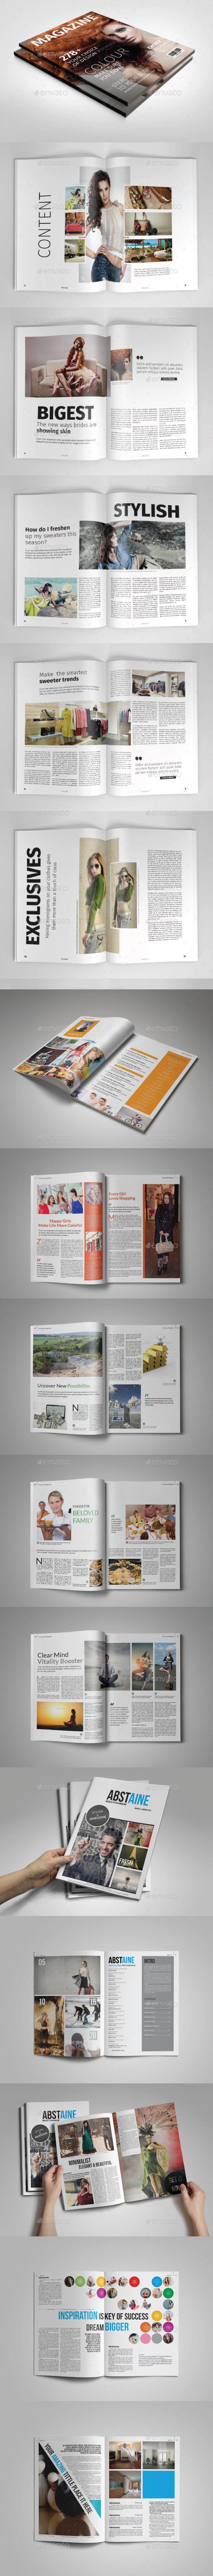 Magazine Bundle Vol. 03 - Magazines Print Templates